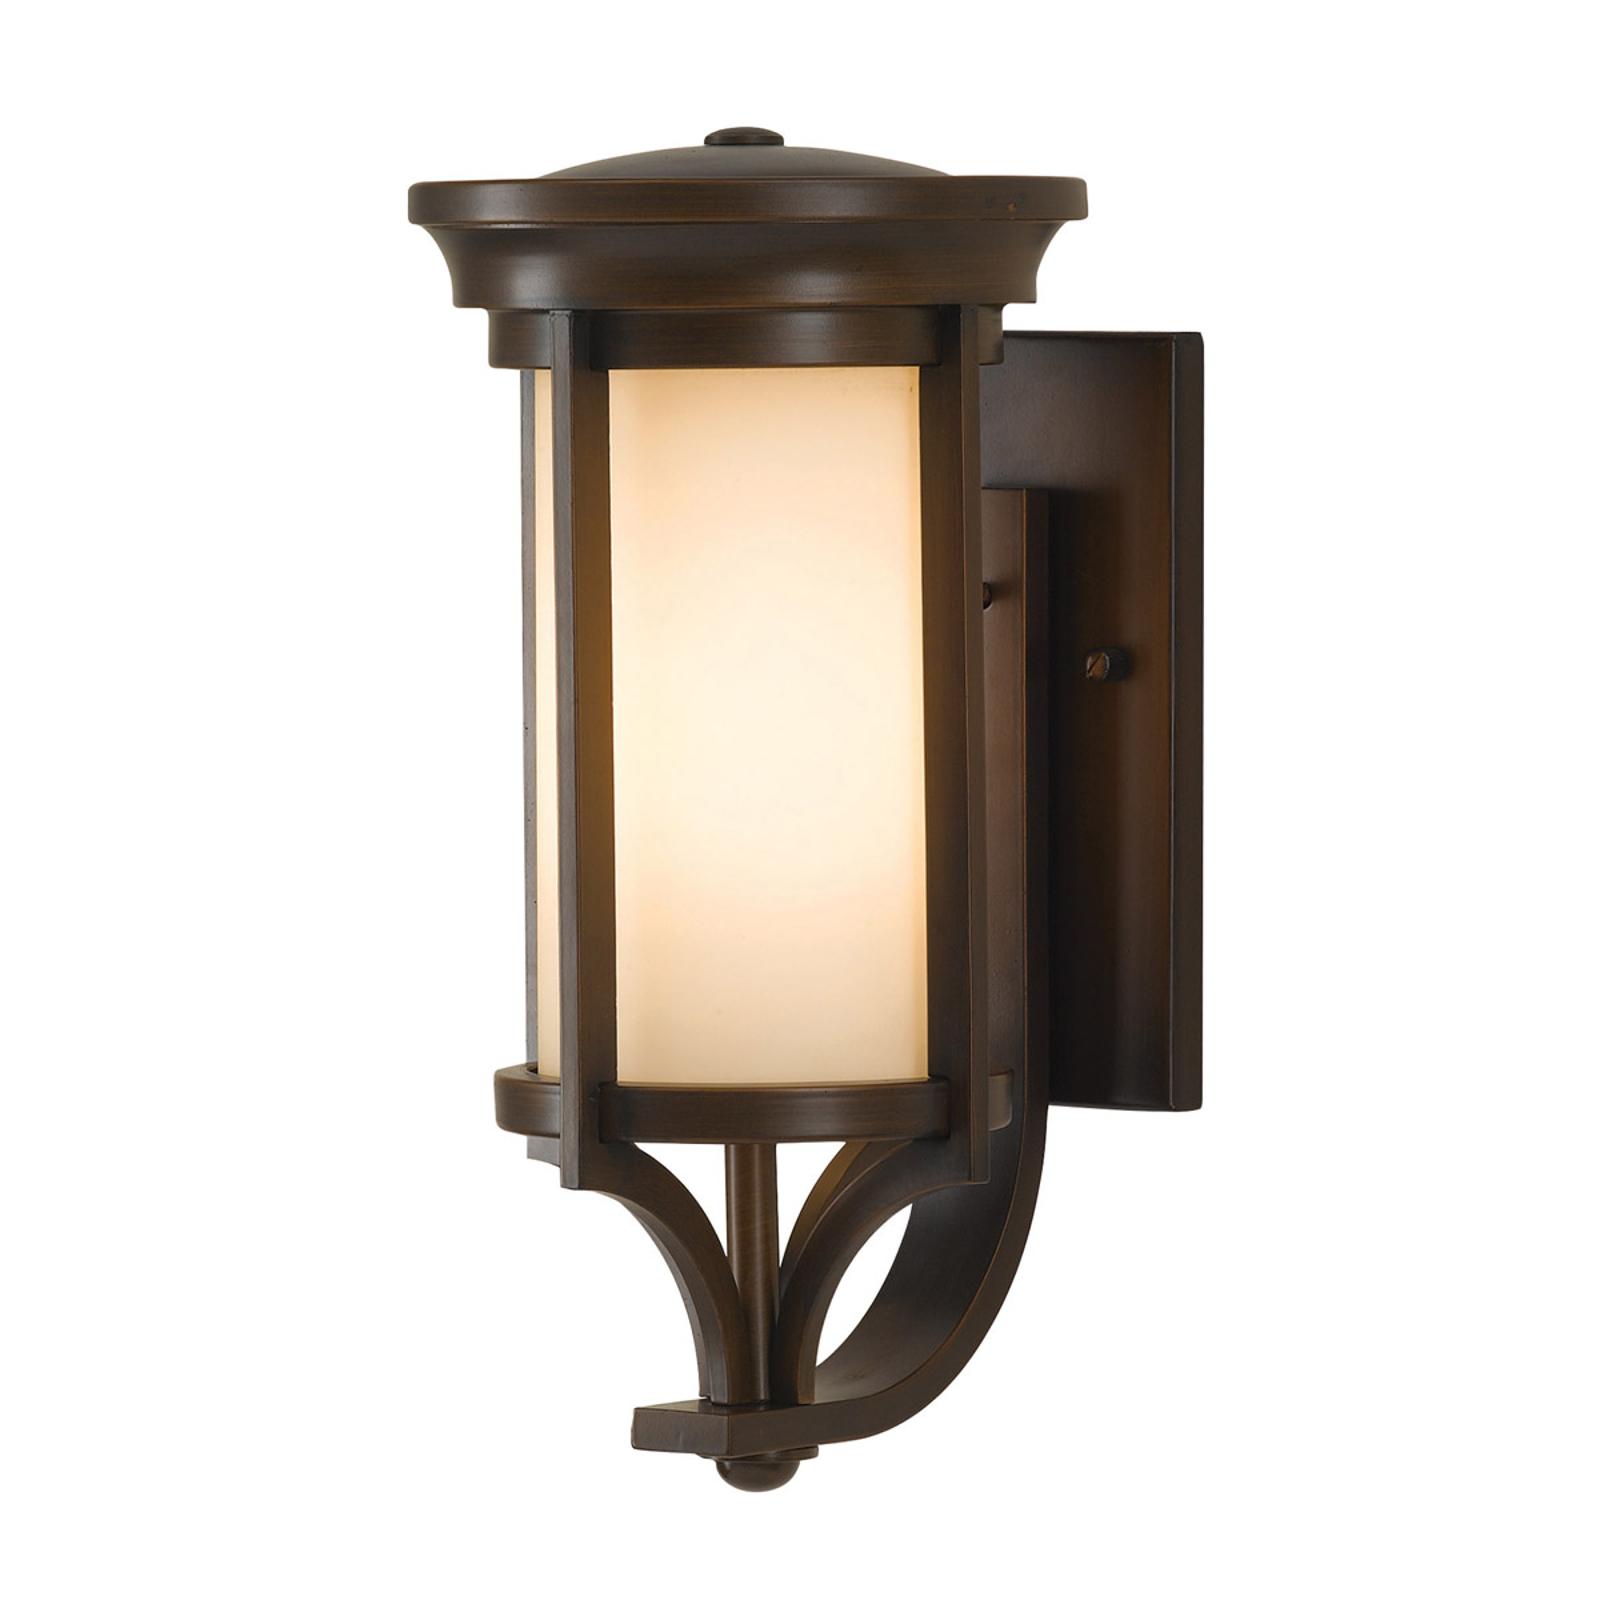 Piękna lampa zewnętrzna Merrill